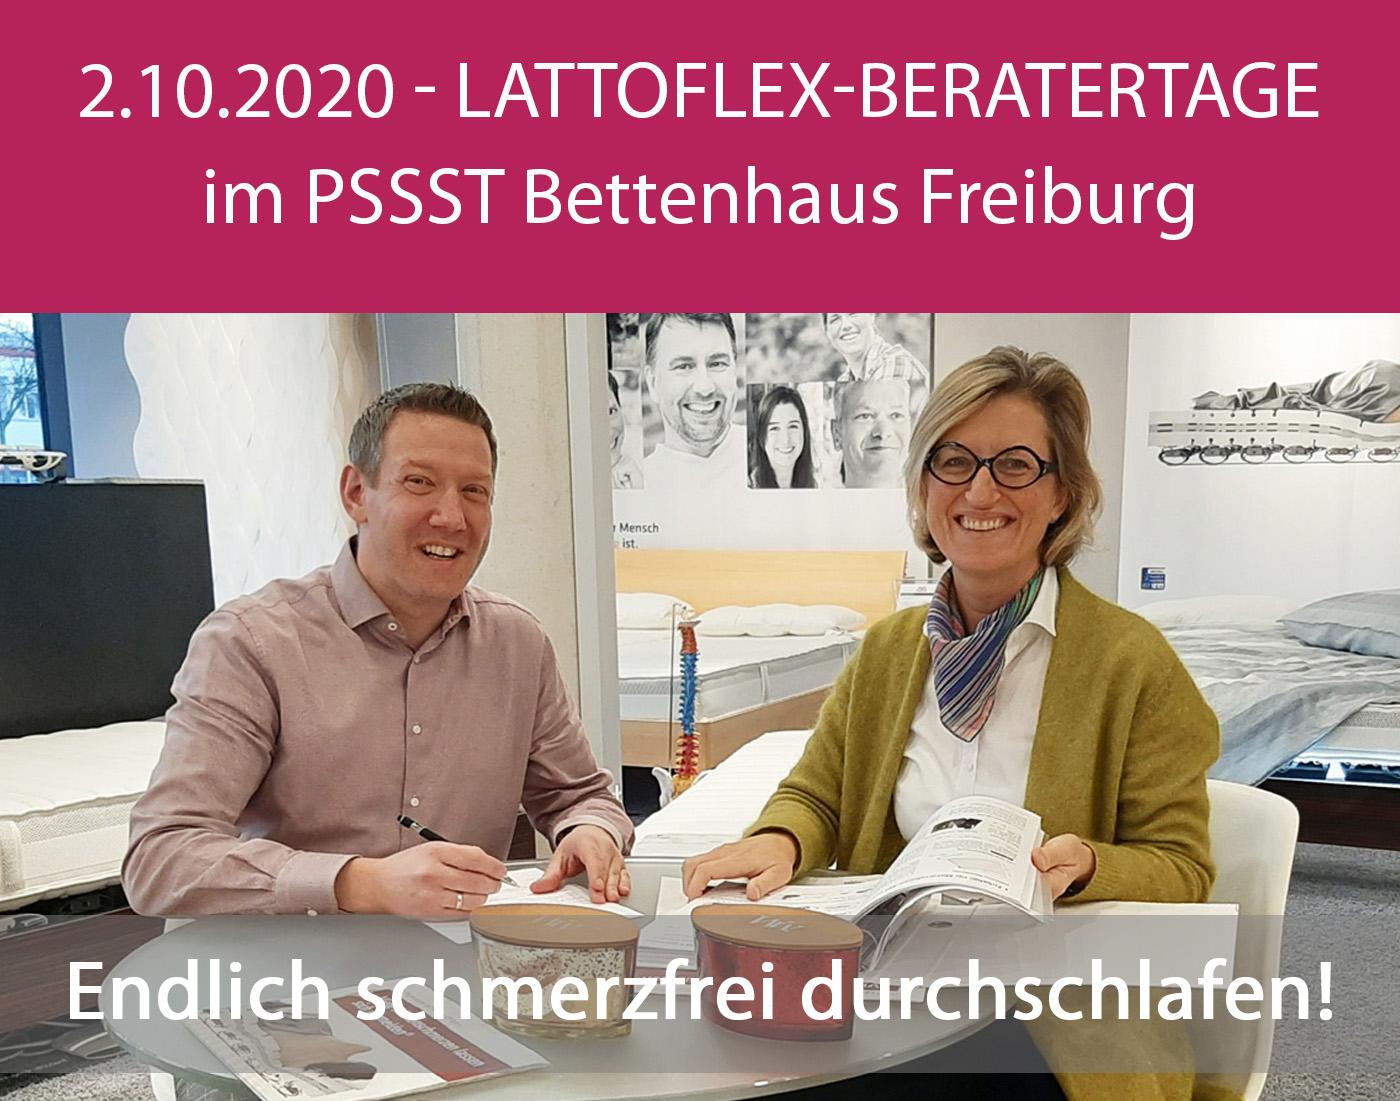 News - PSSST-Lattoflex-Beratertage Freitag 2.10.2020